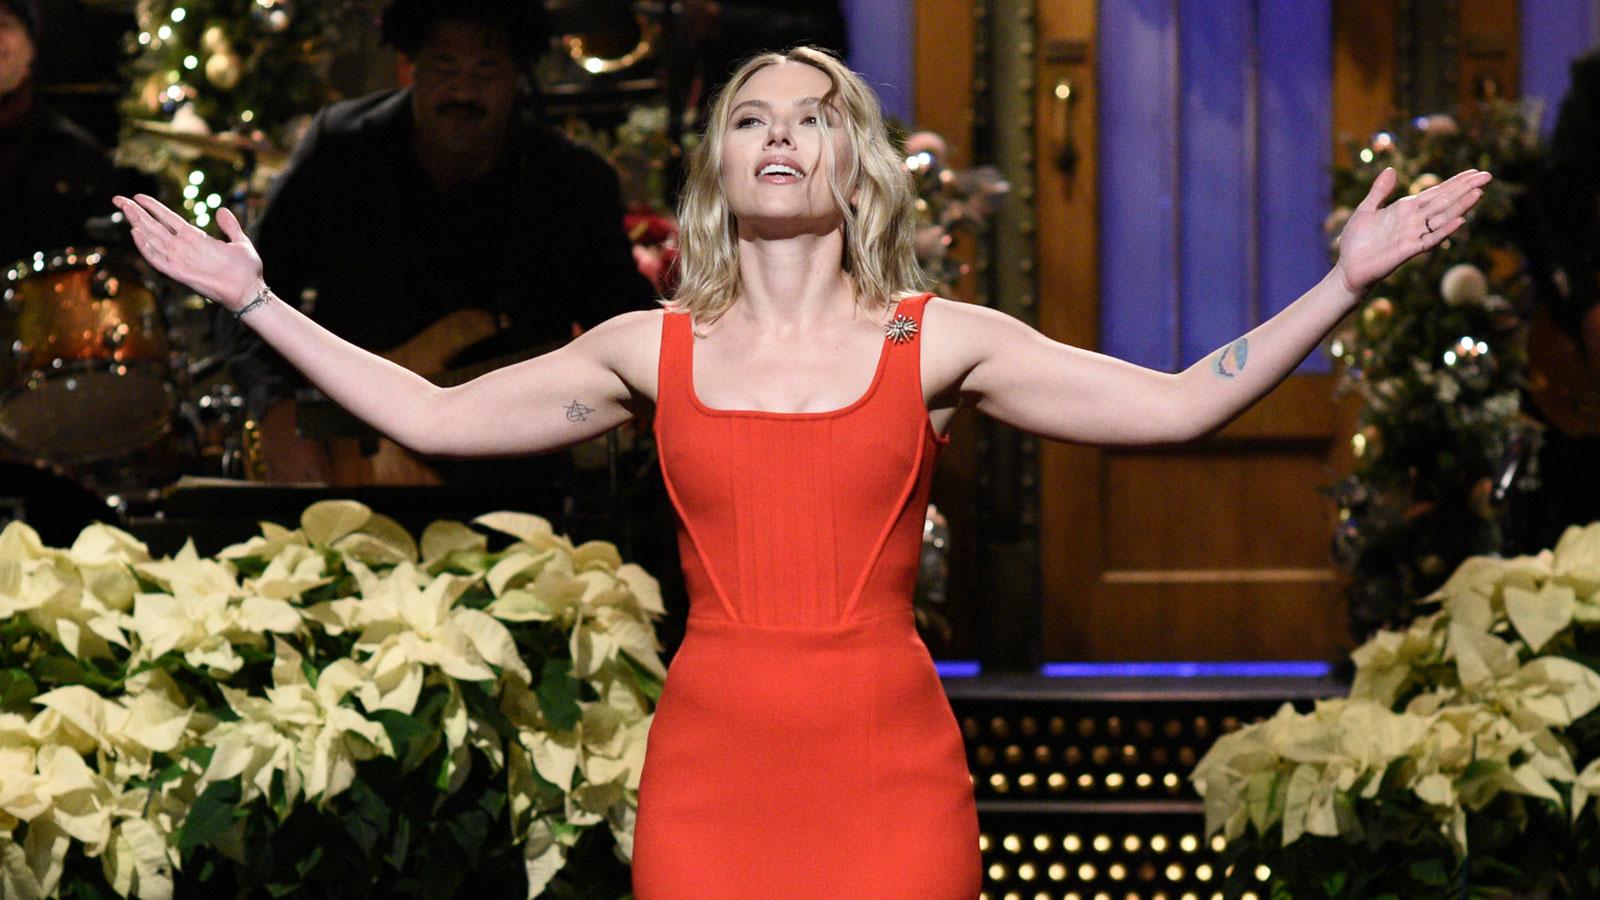 Scarlett Johansson Teases Colin Jost During Snl Hosting Duties Cnn Video